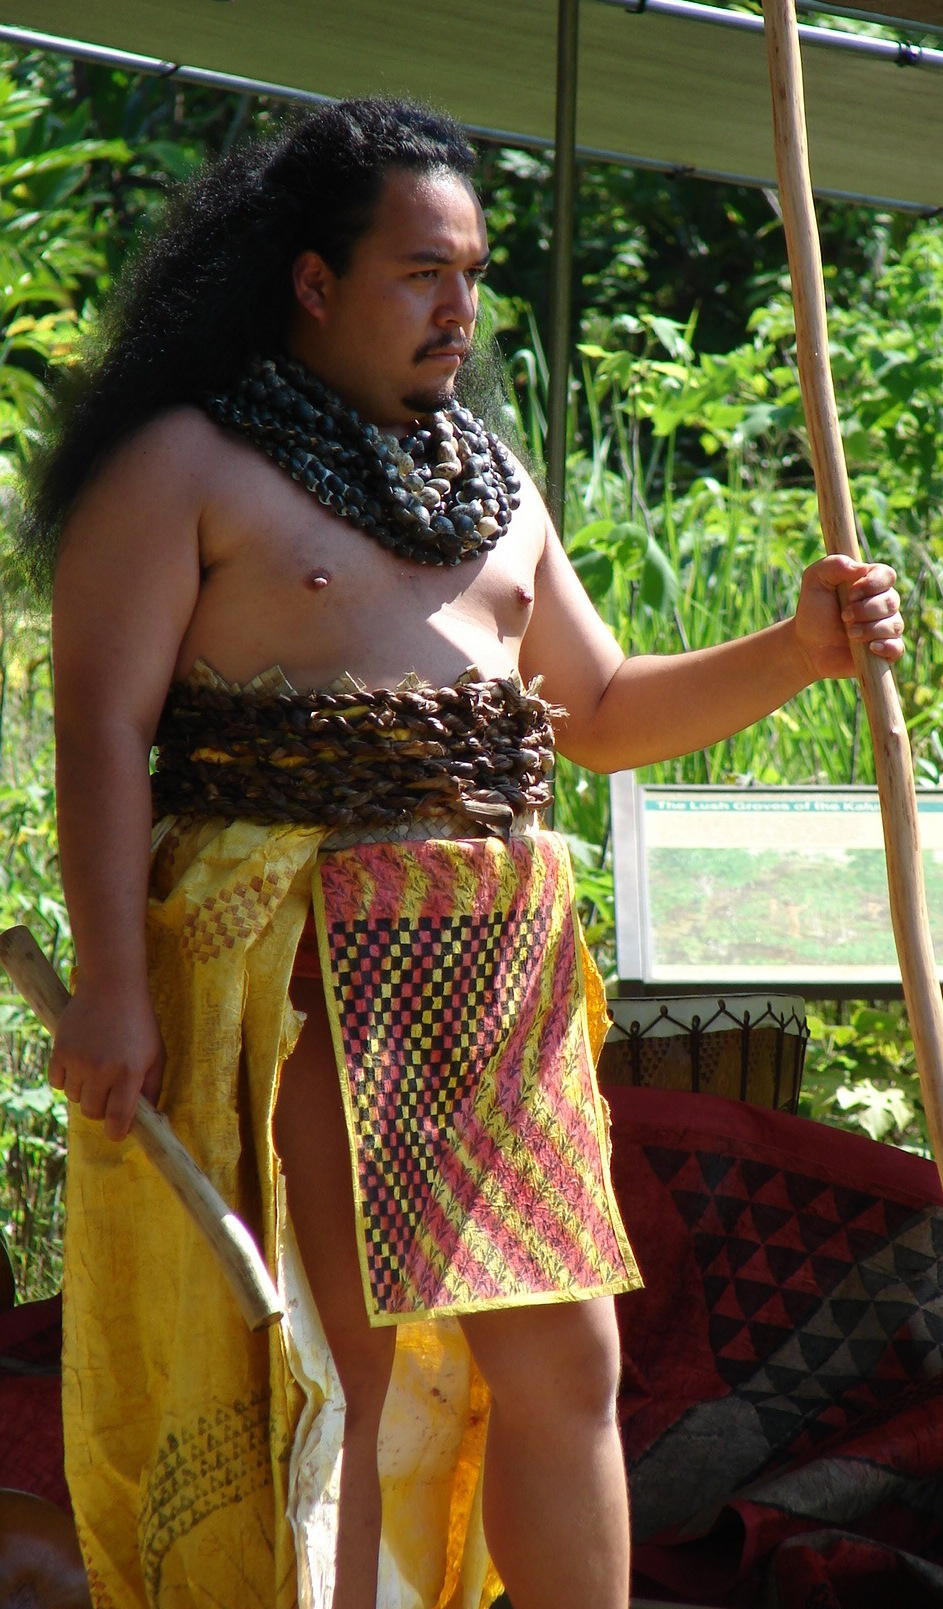 [Full kapa] Kumu Micah Kamohoaliʻi in full kapa. Photo by Micah Kamohoaliʻi.